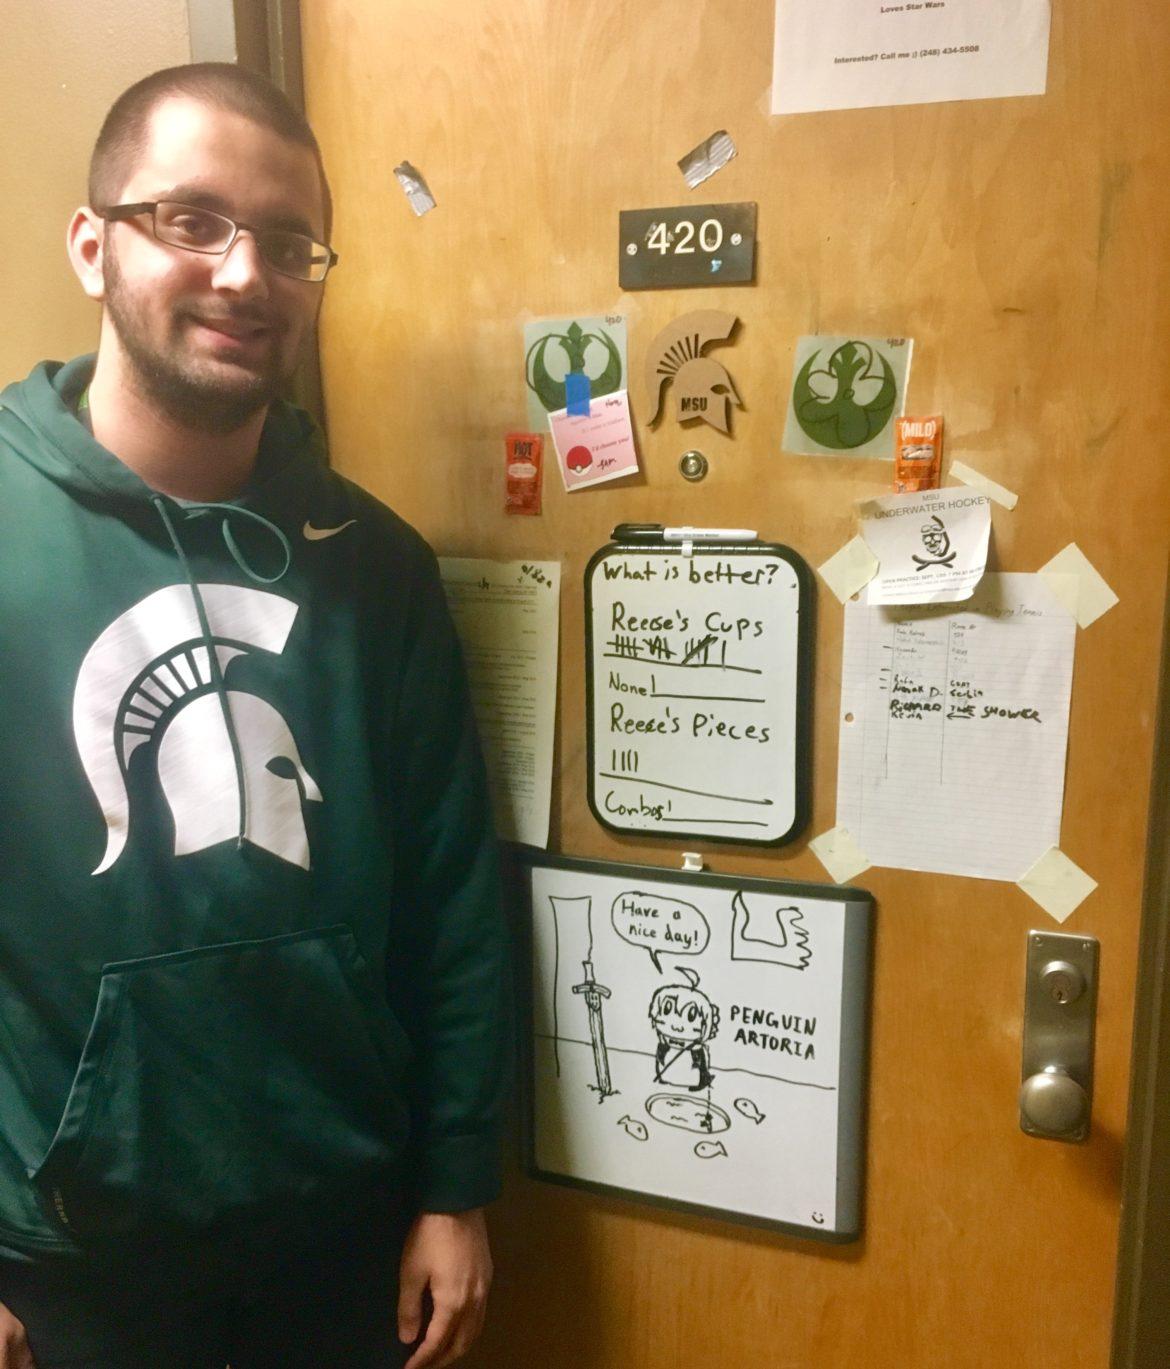 Kade Katrak shows off his whiteboards